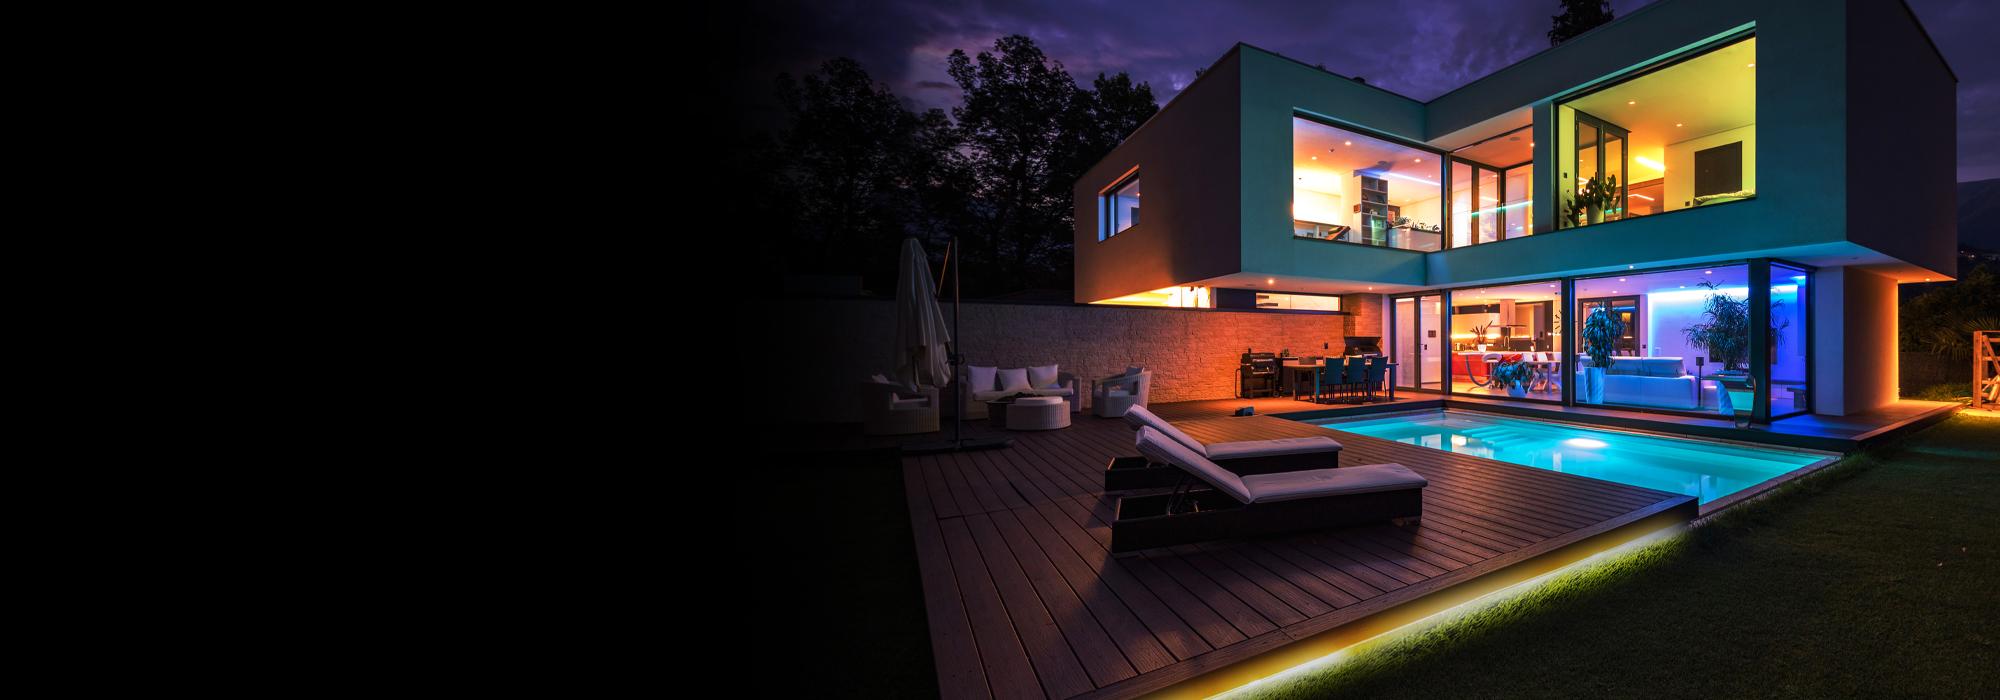 Neon Smart Multi Color Multi White Indoor Outdoor Led Light Strip 16 4ft Monster Illuminessence